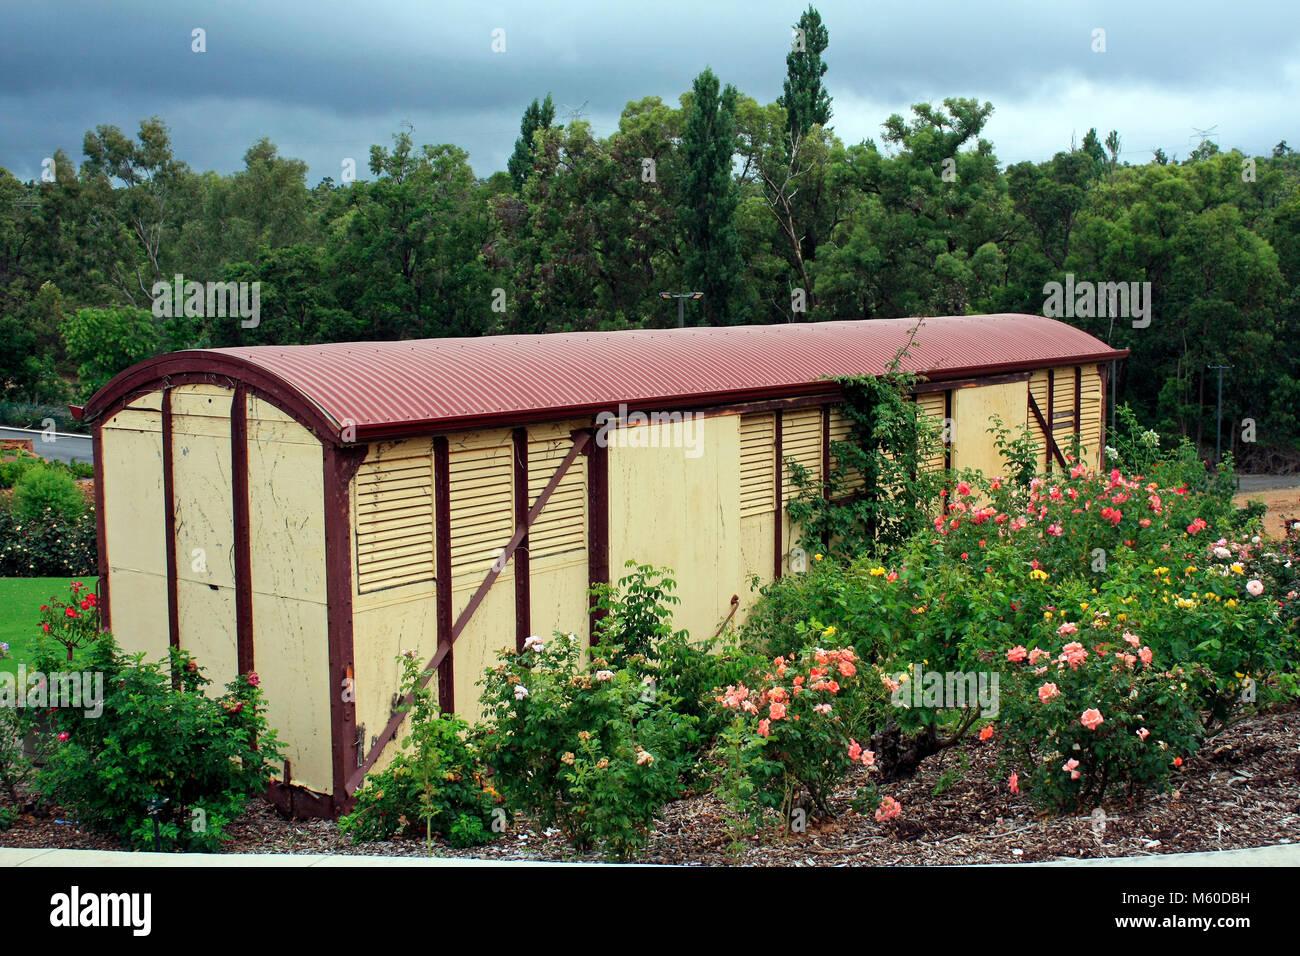 Railway Goods Wagon Garden Nursery Garden Shed Perth Hills Australia    Stock Image